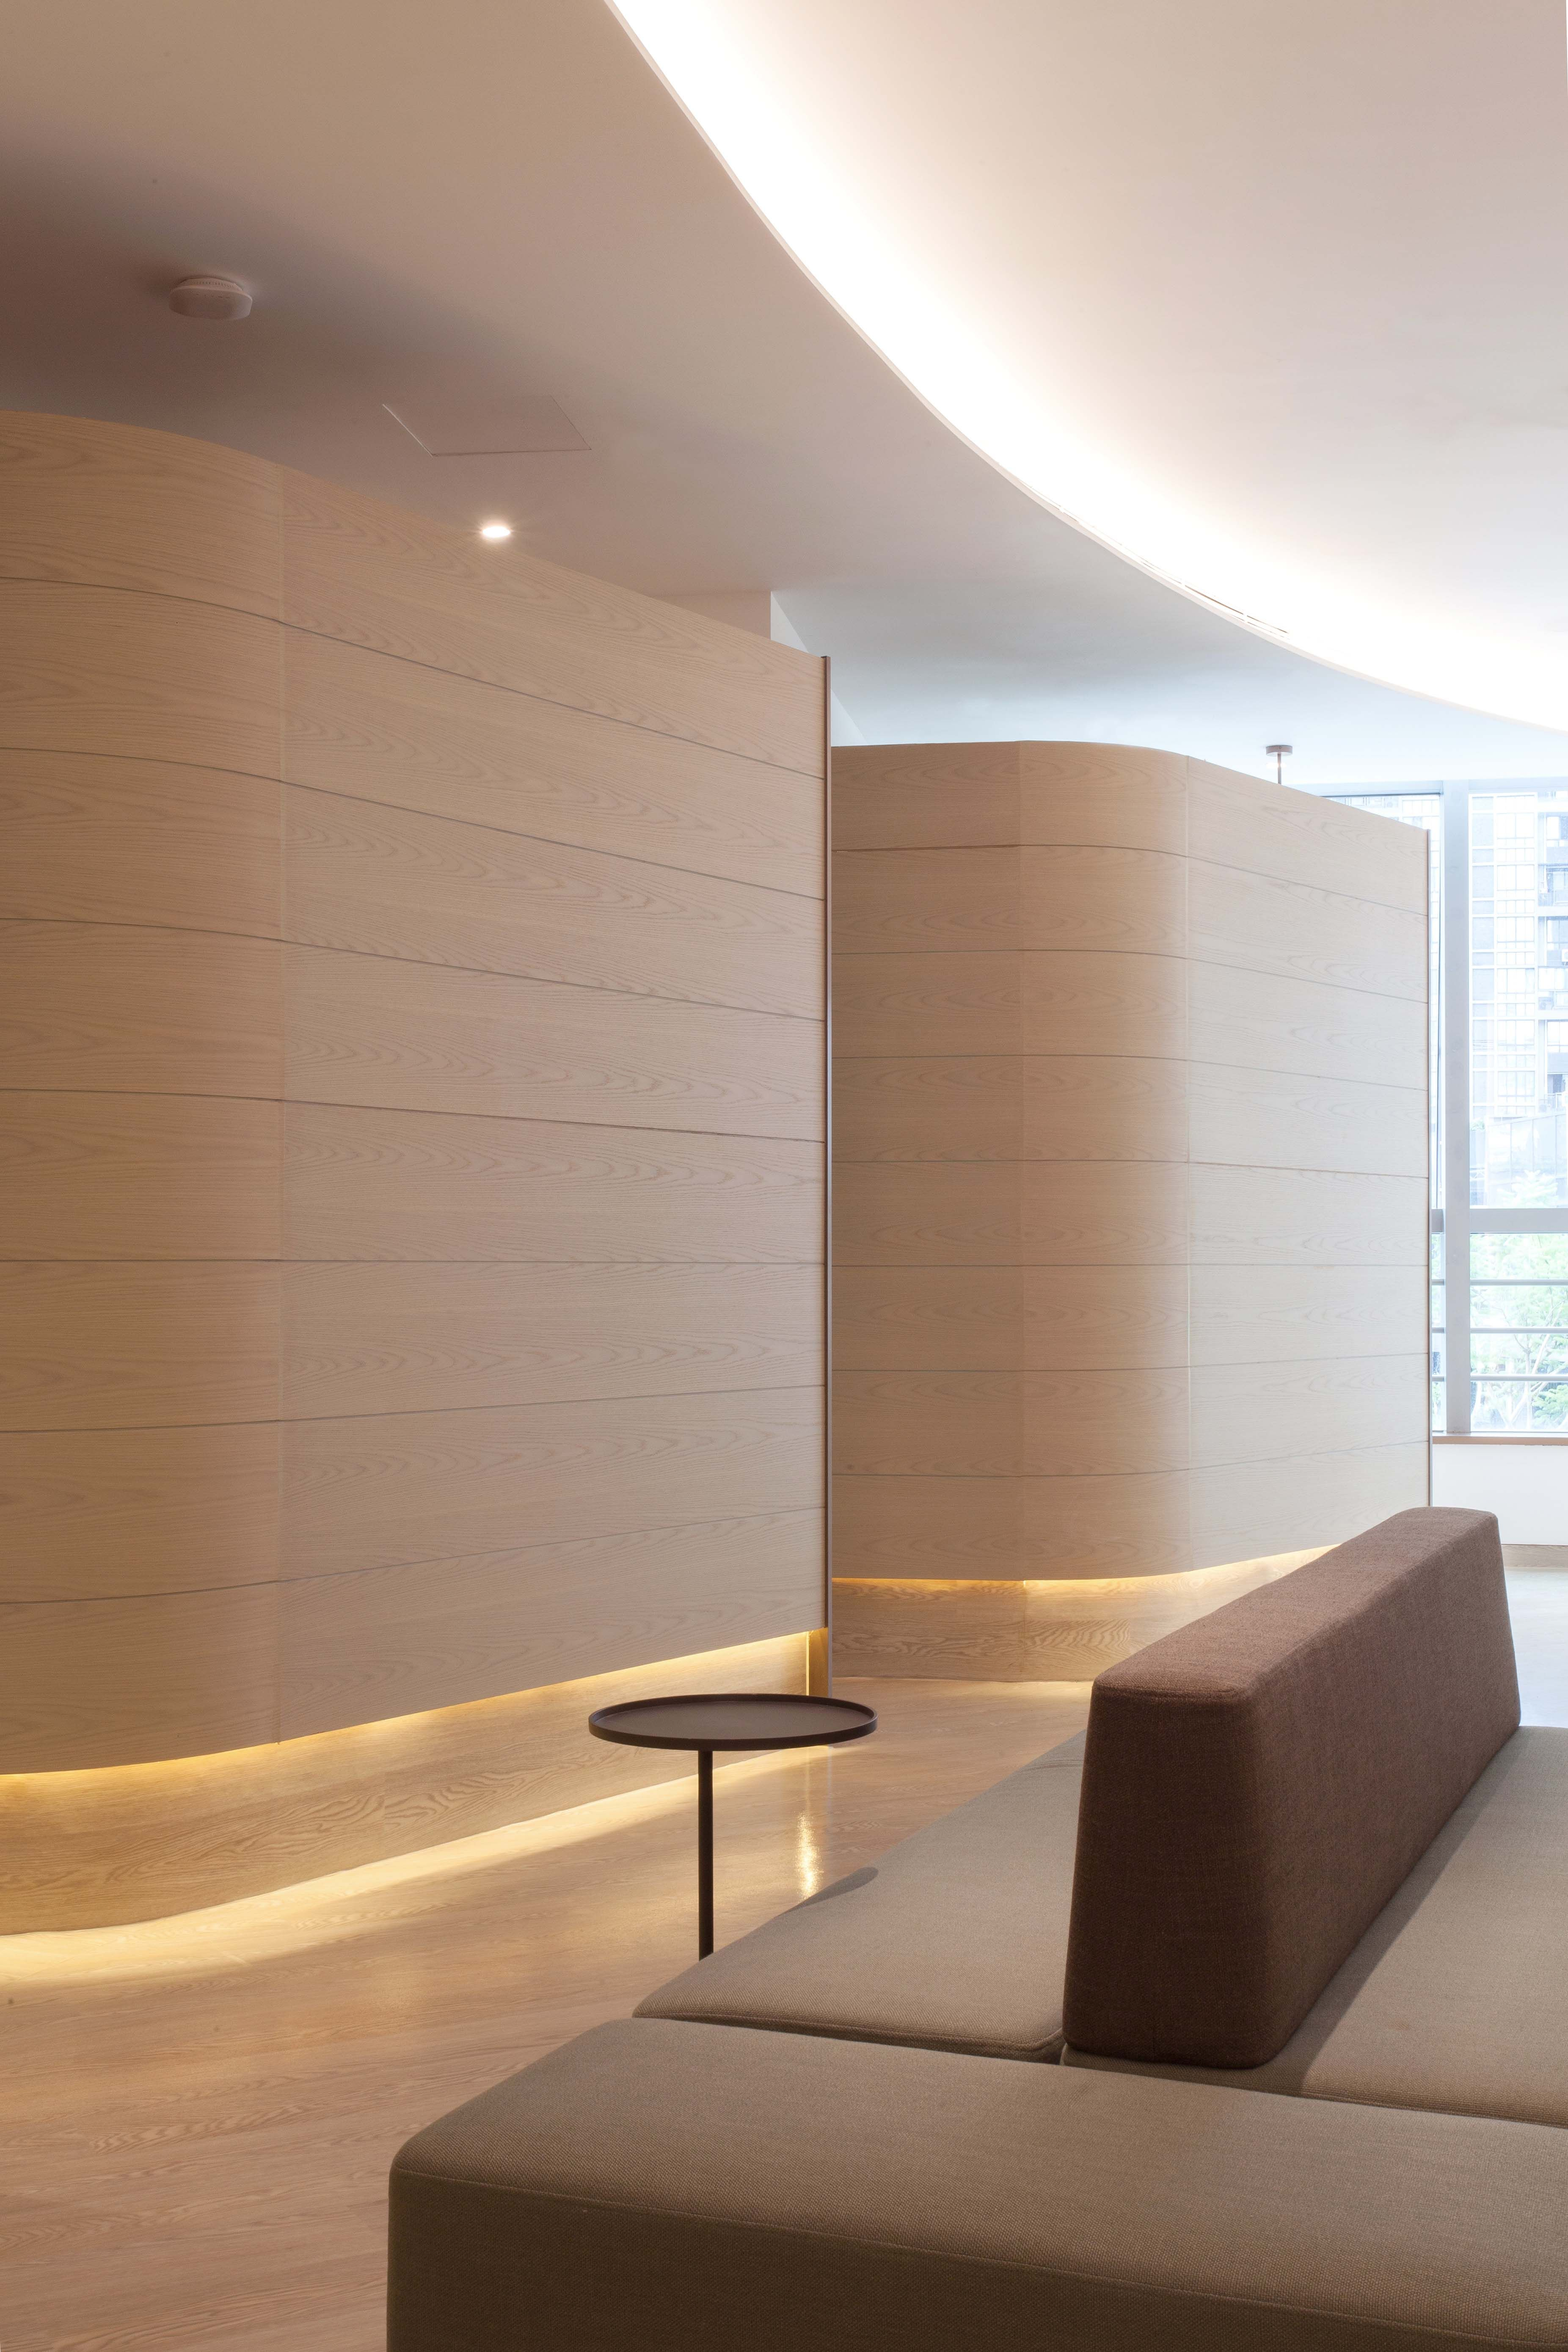 Studio Adjective Interior Design Comfort Interior Design Gynecology Pediatric Gree Hospital Interior Design Clinic Interior Design Interior Wall Design